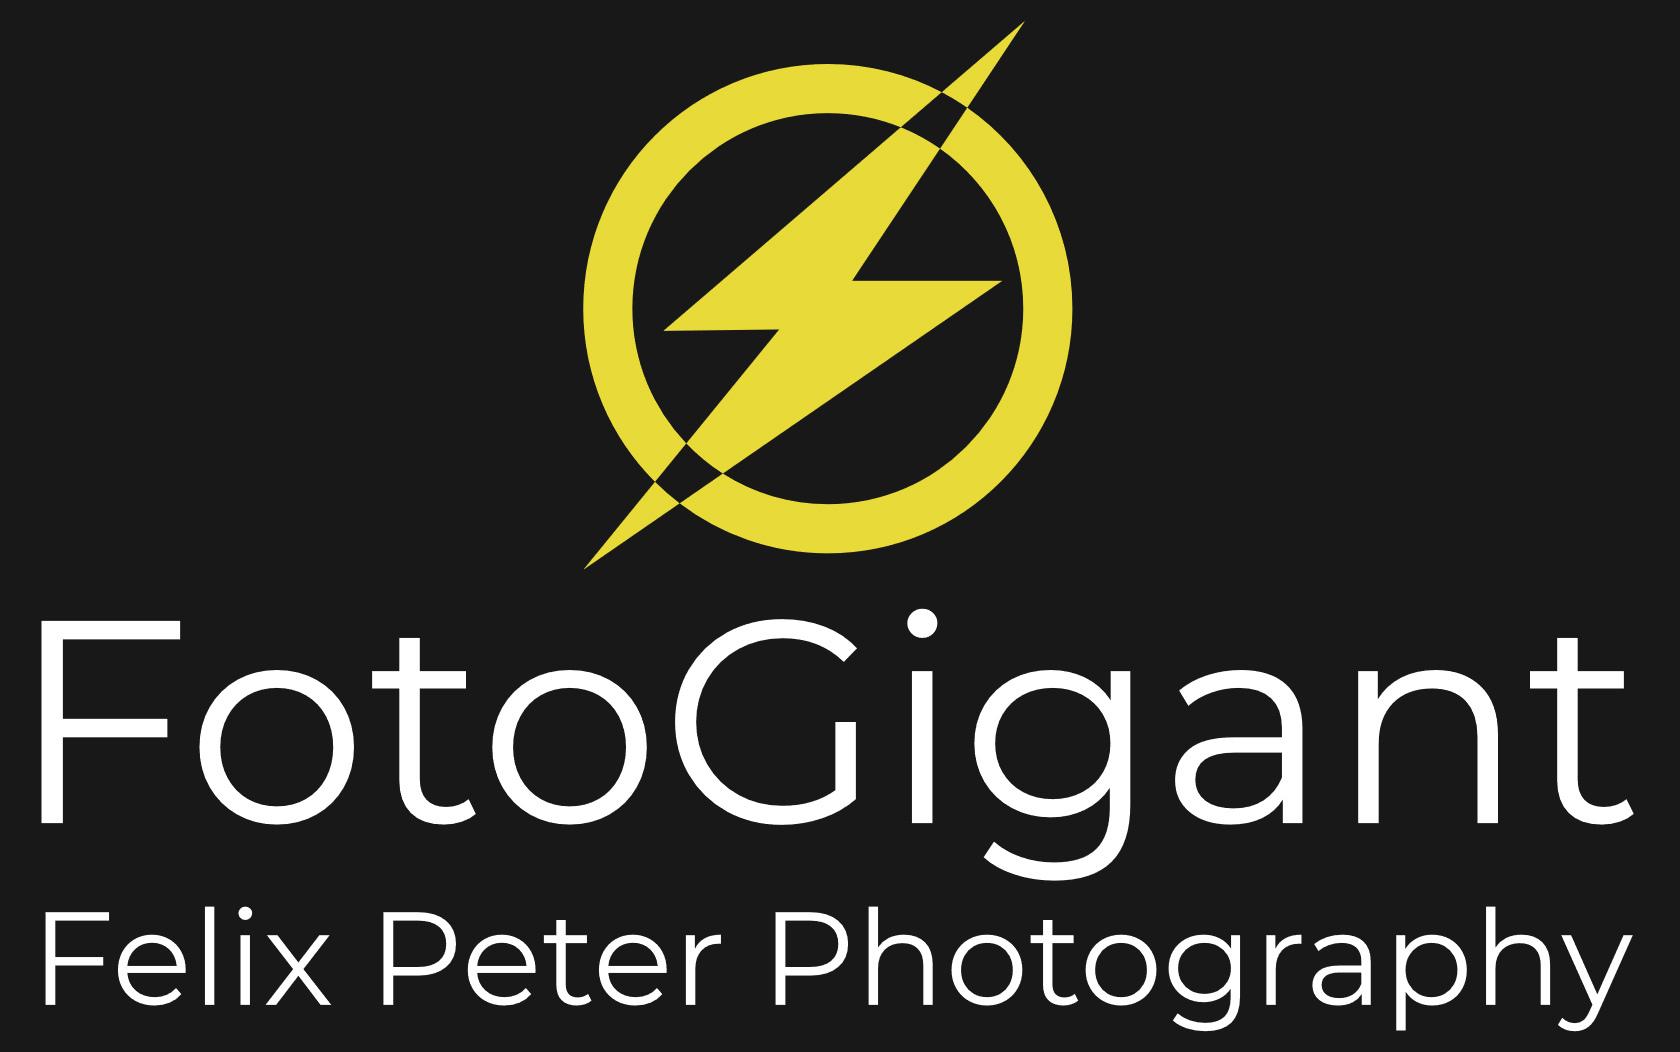 Felix Peter Photography - www.FotoGigant.ch